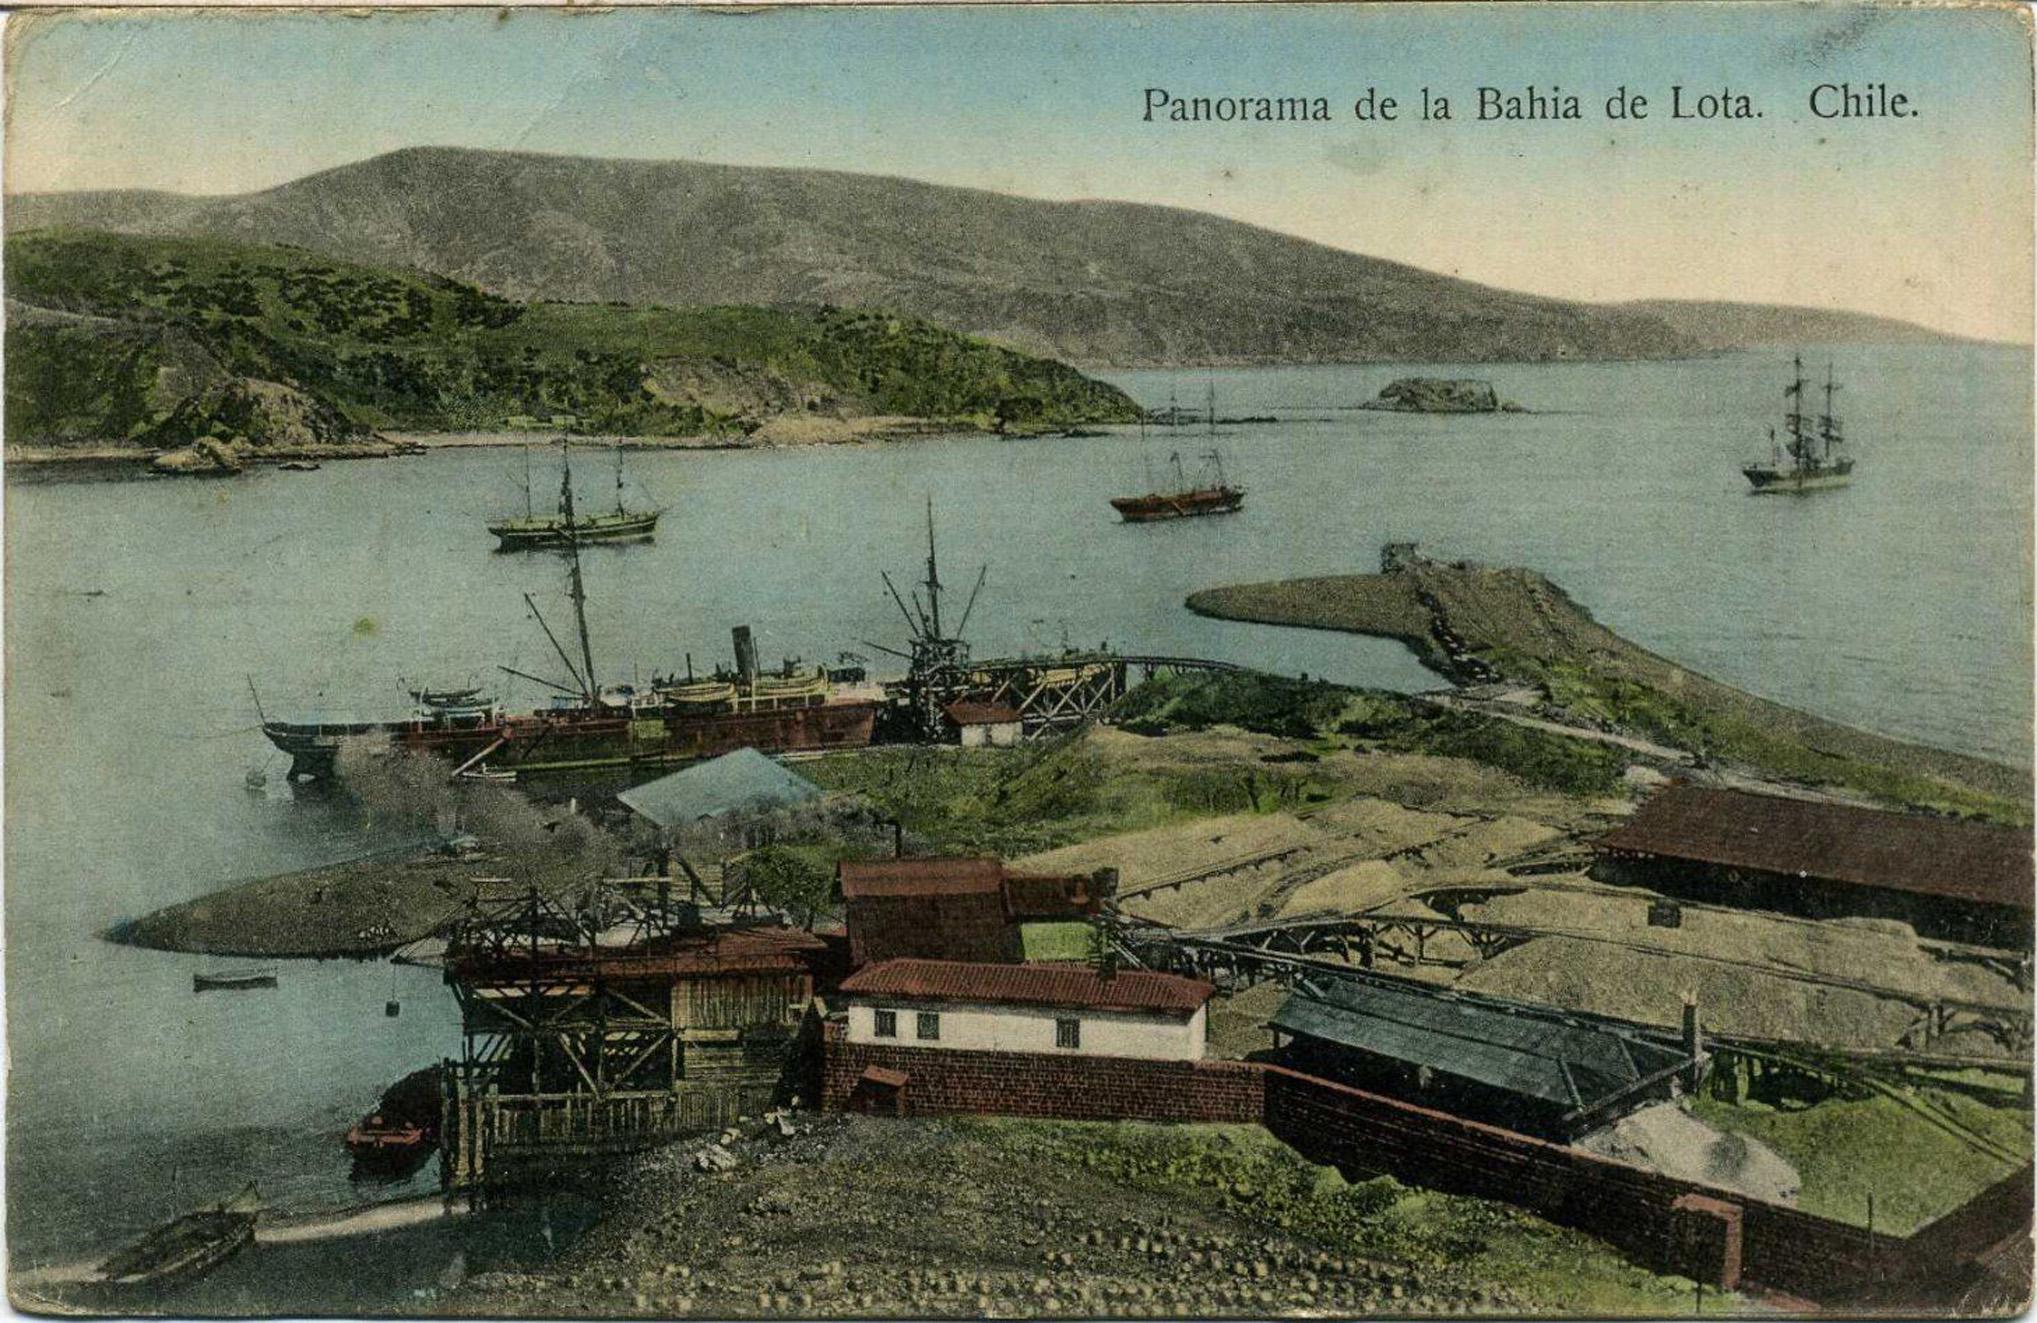 Enterreno - Fotos históricas de chile - fotos antiguas de Chile - Bahia de Lota, 1915